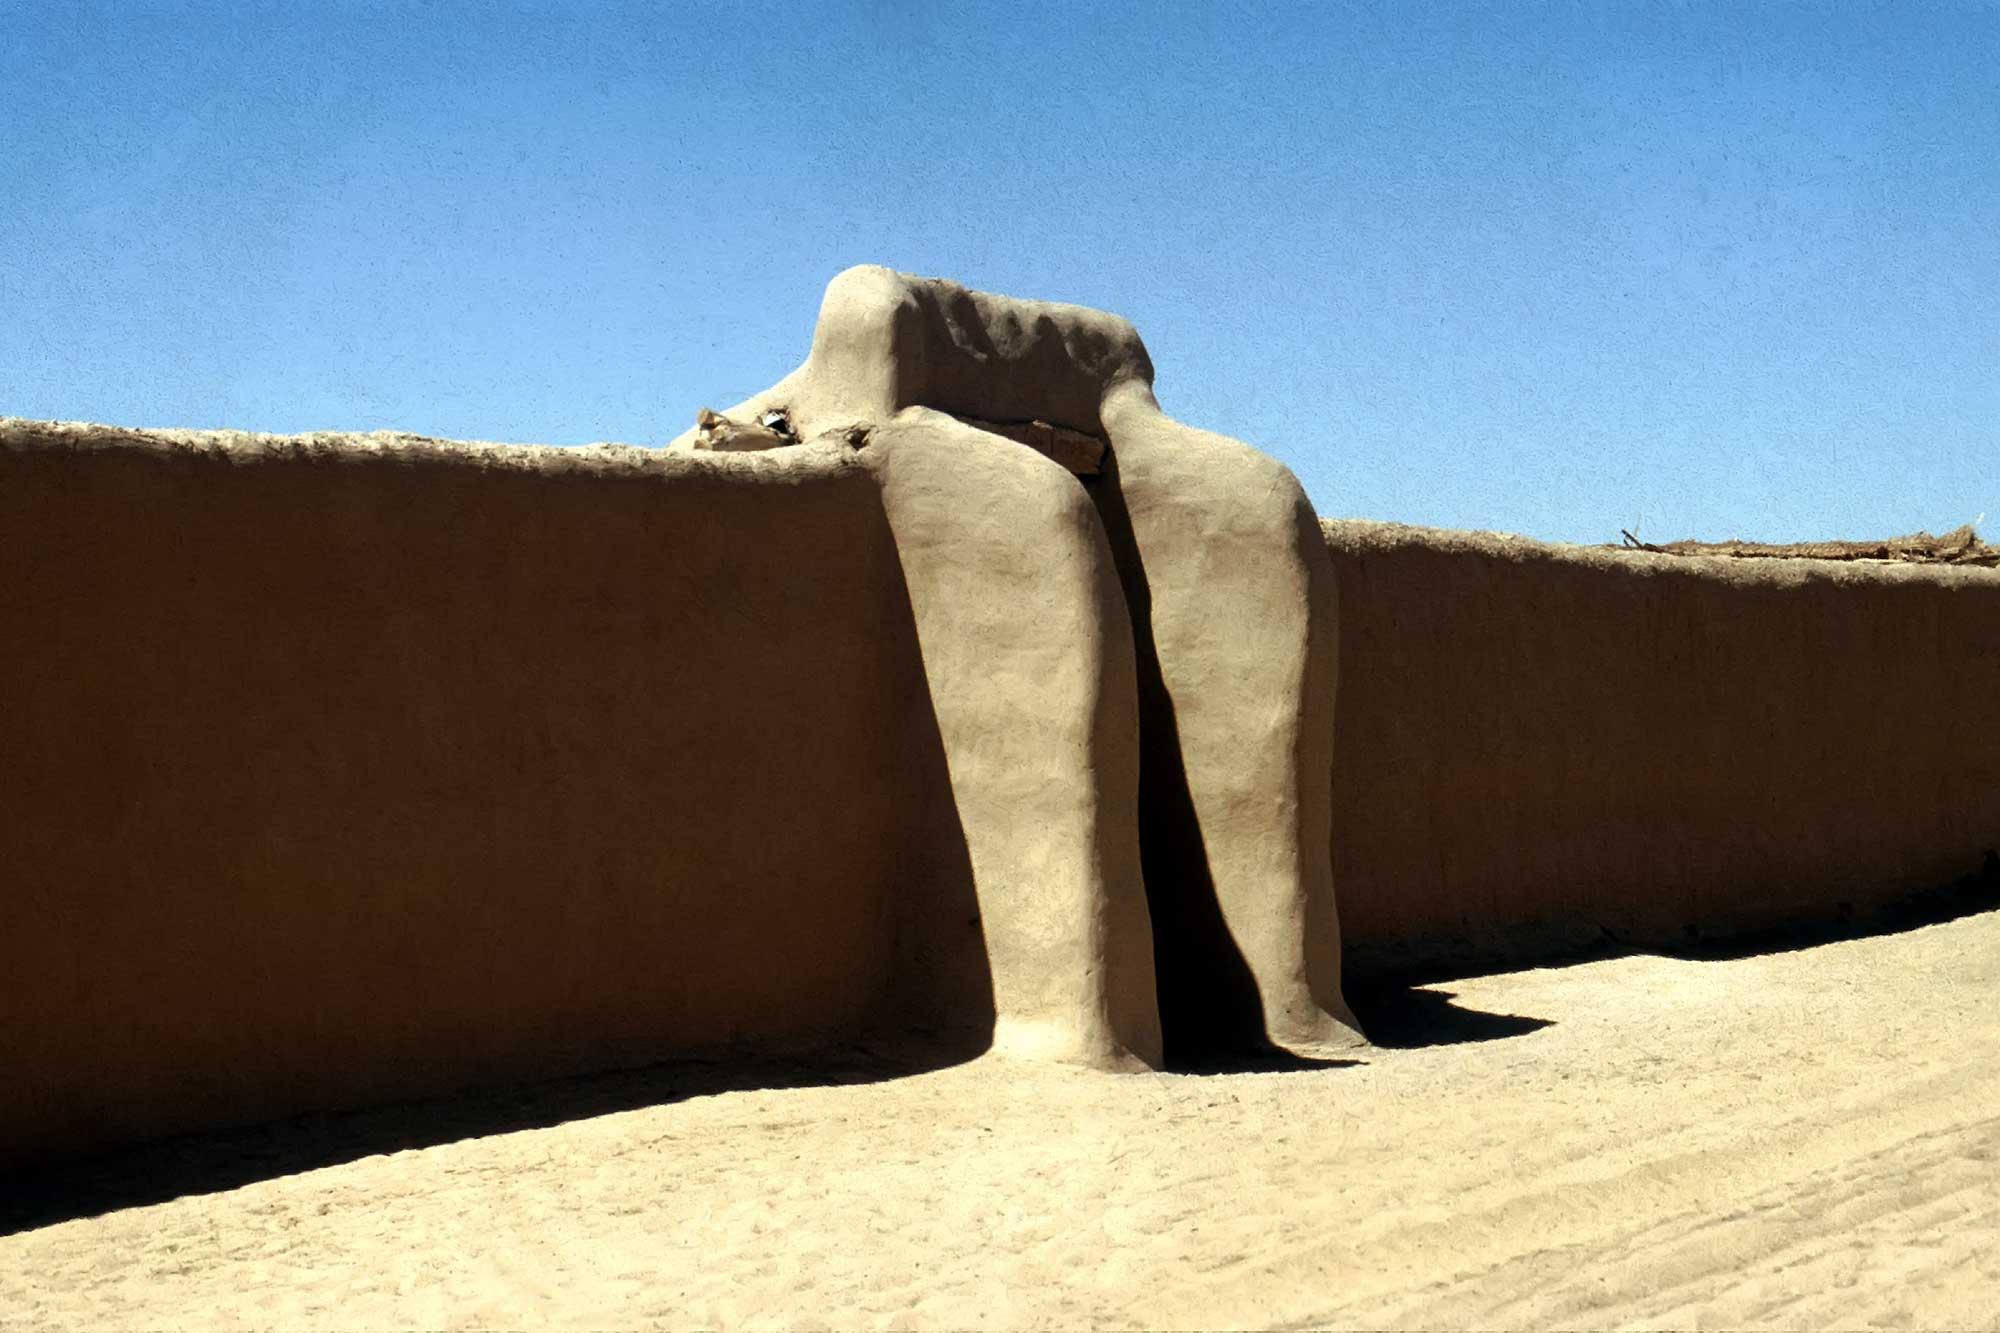 northern-sudan-karima-wall-africa